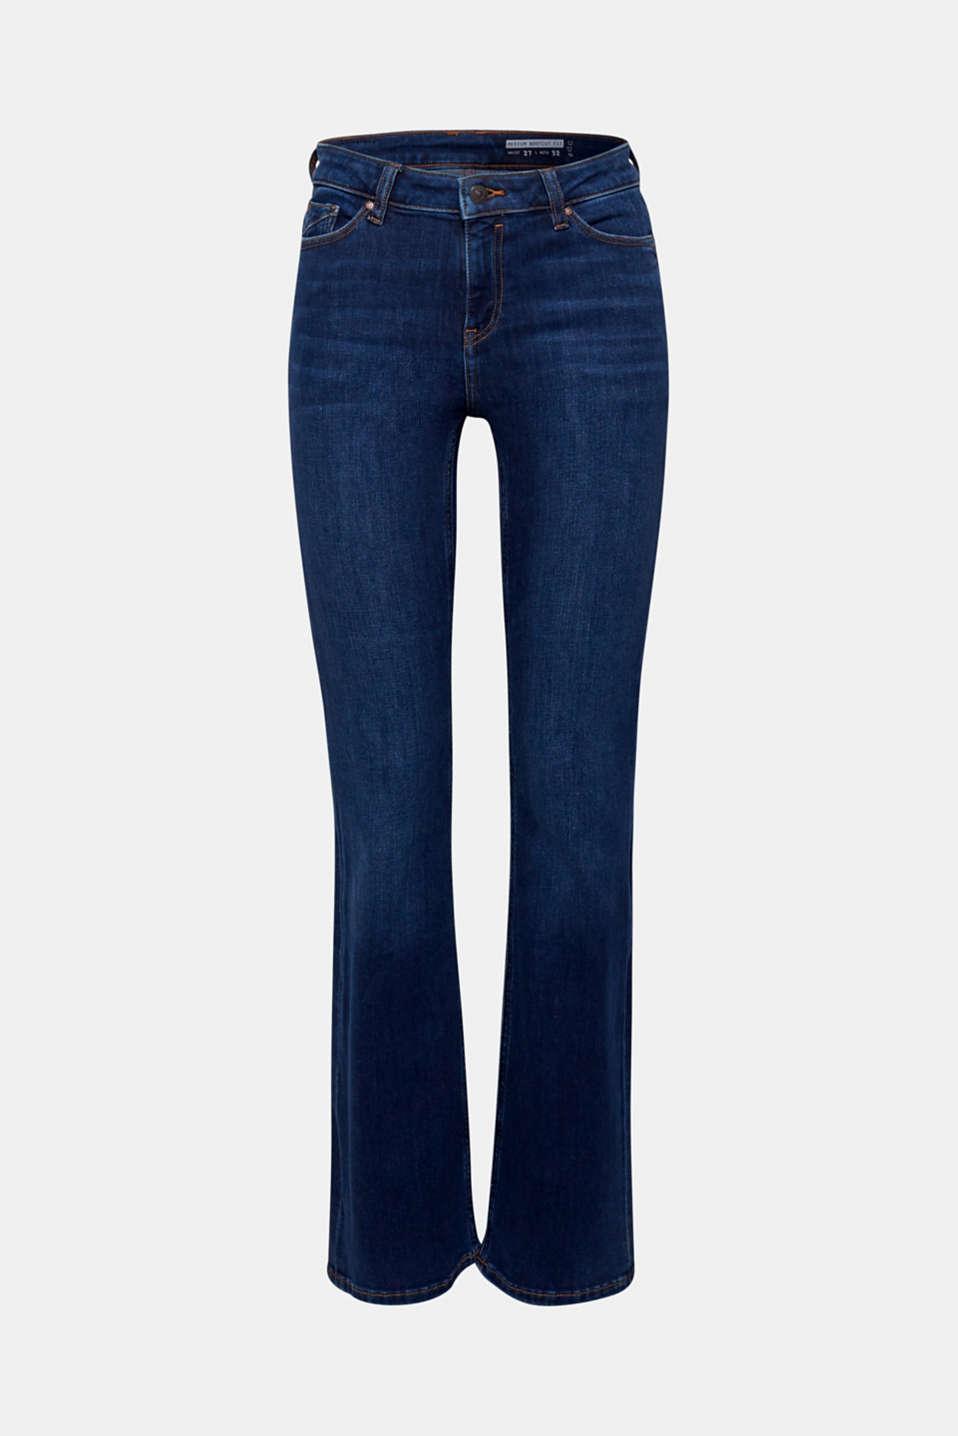 Pants denim, BLUE DARK WASH, detail image number 8